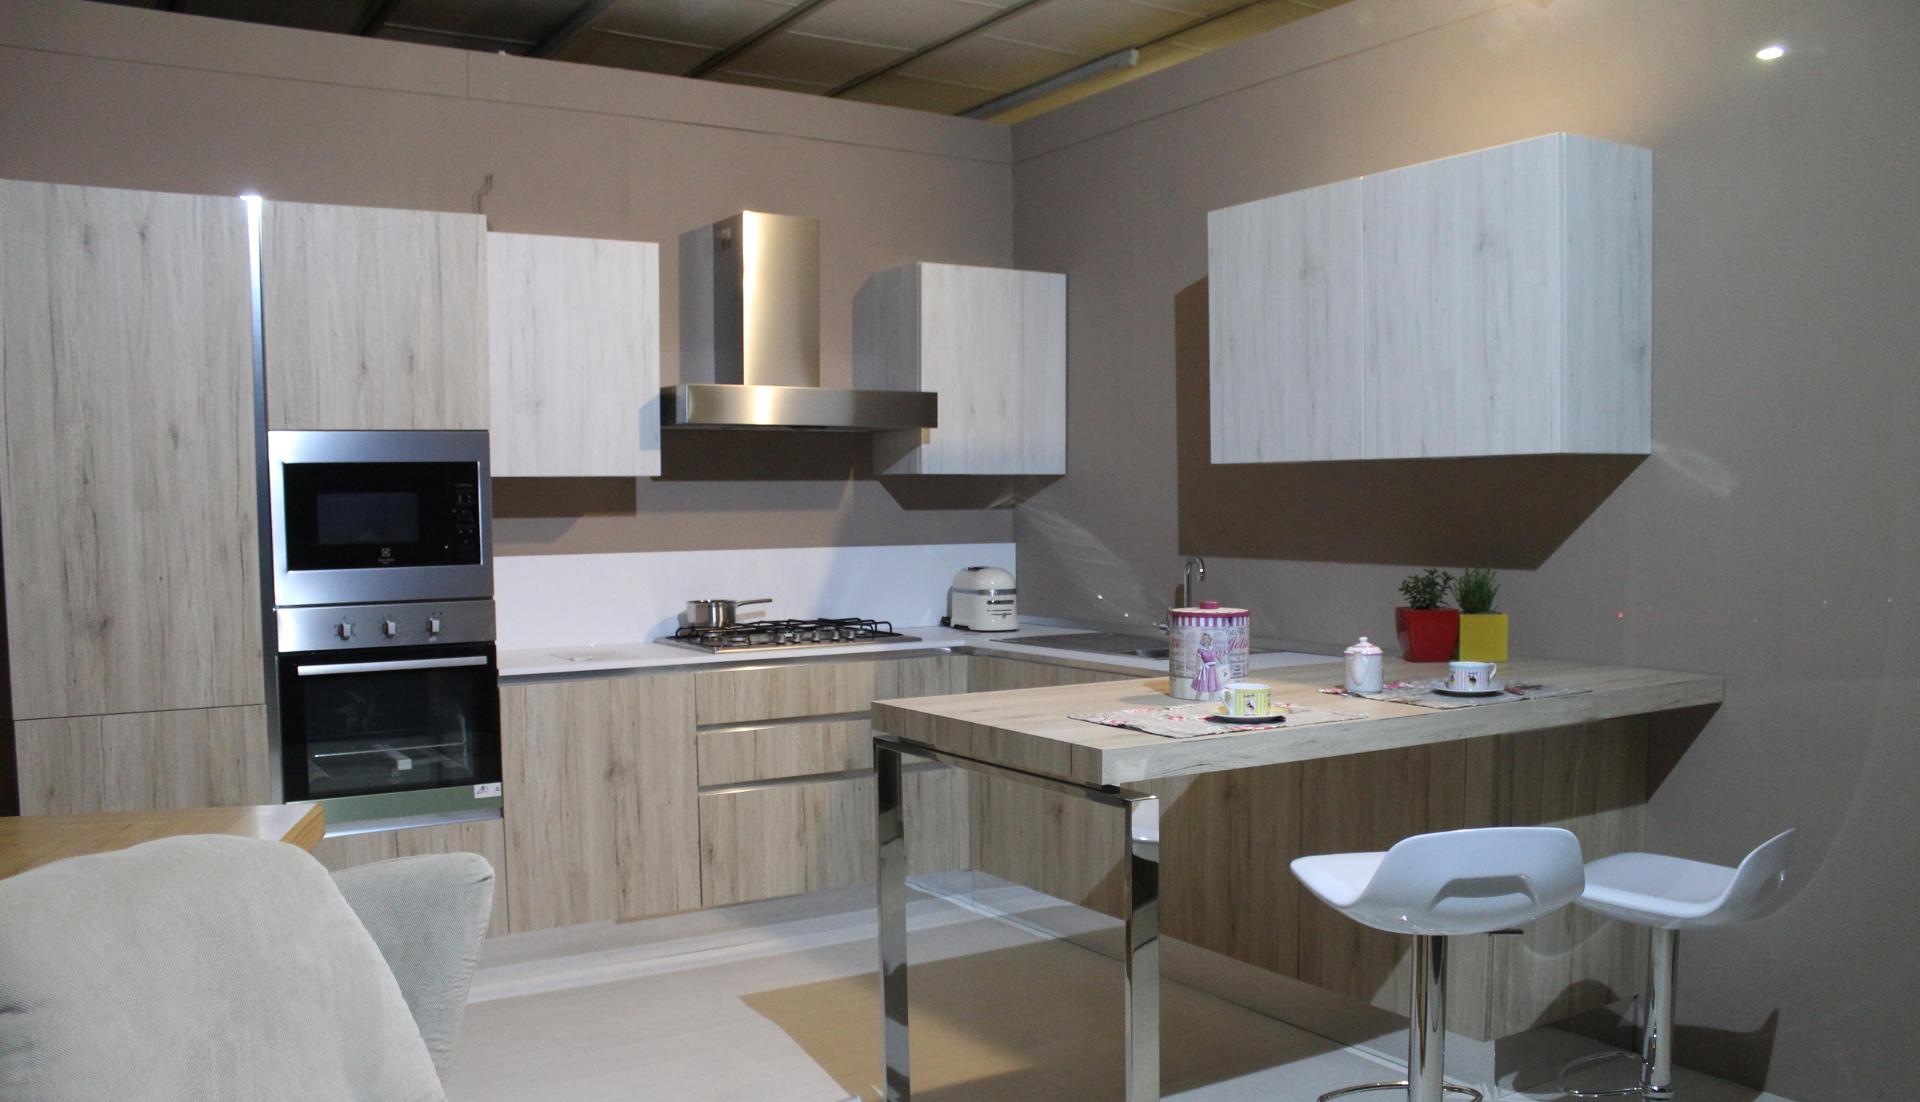 podloga-drewniana-kuchnia Parkiet w kuchni - Telefon: 609-370-990